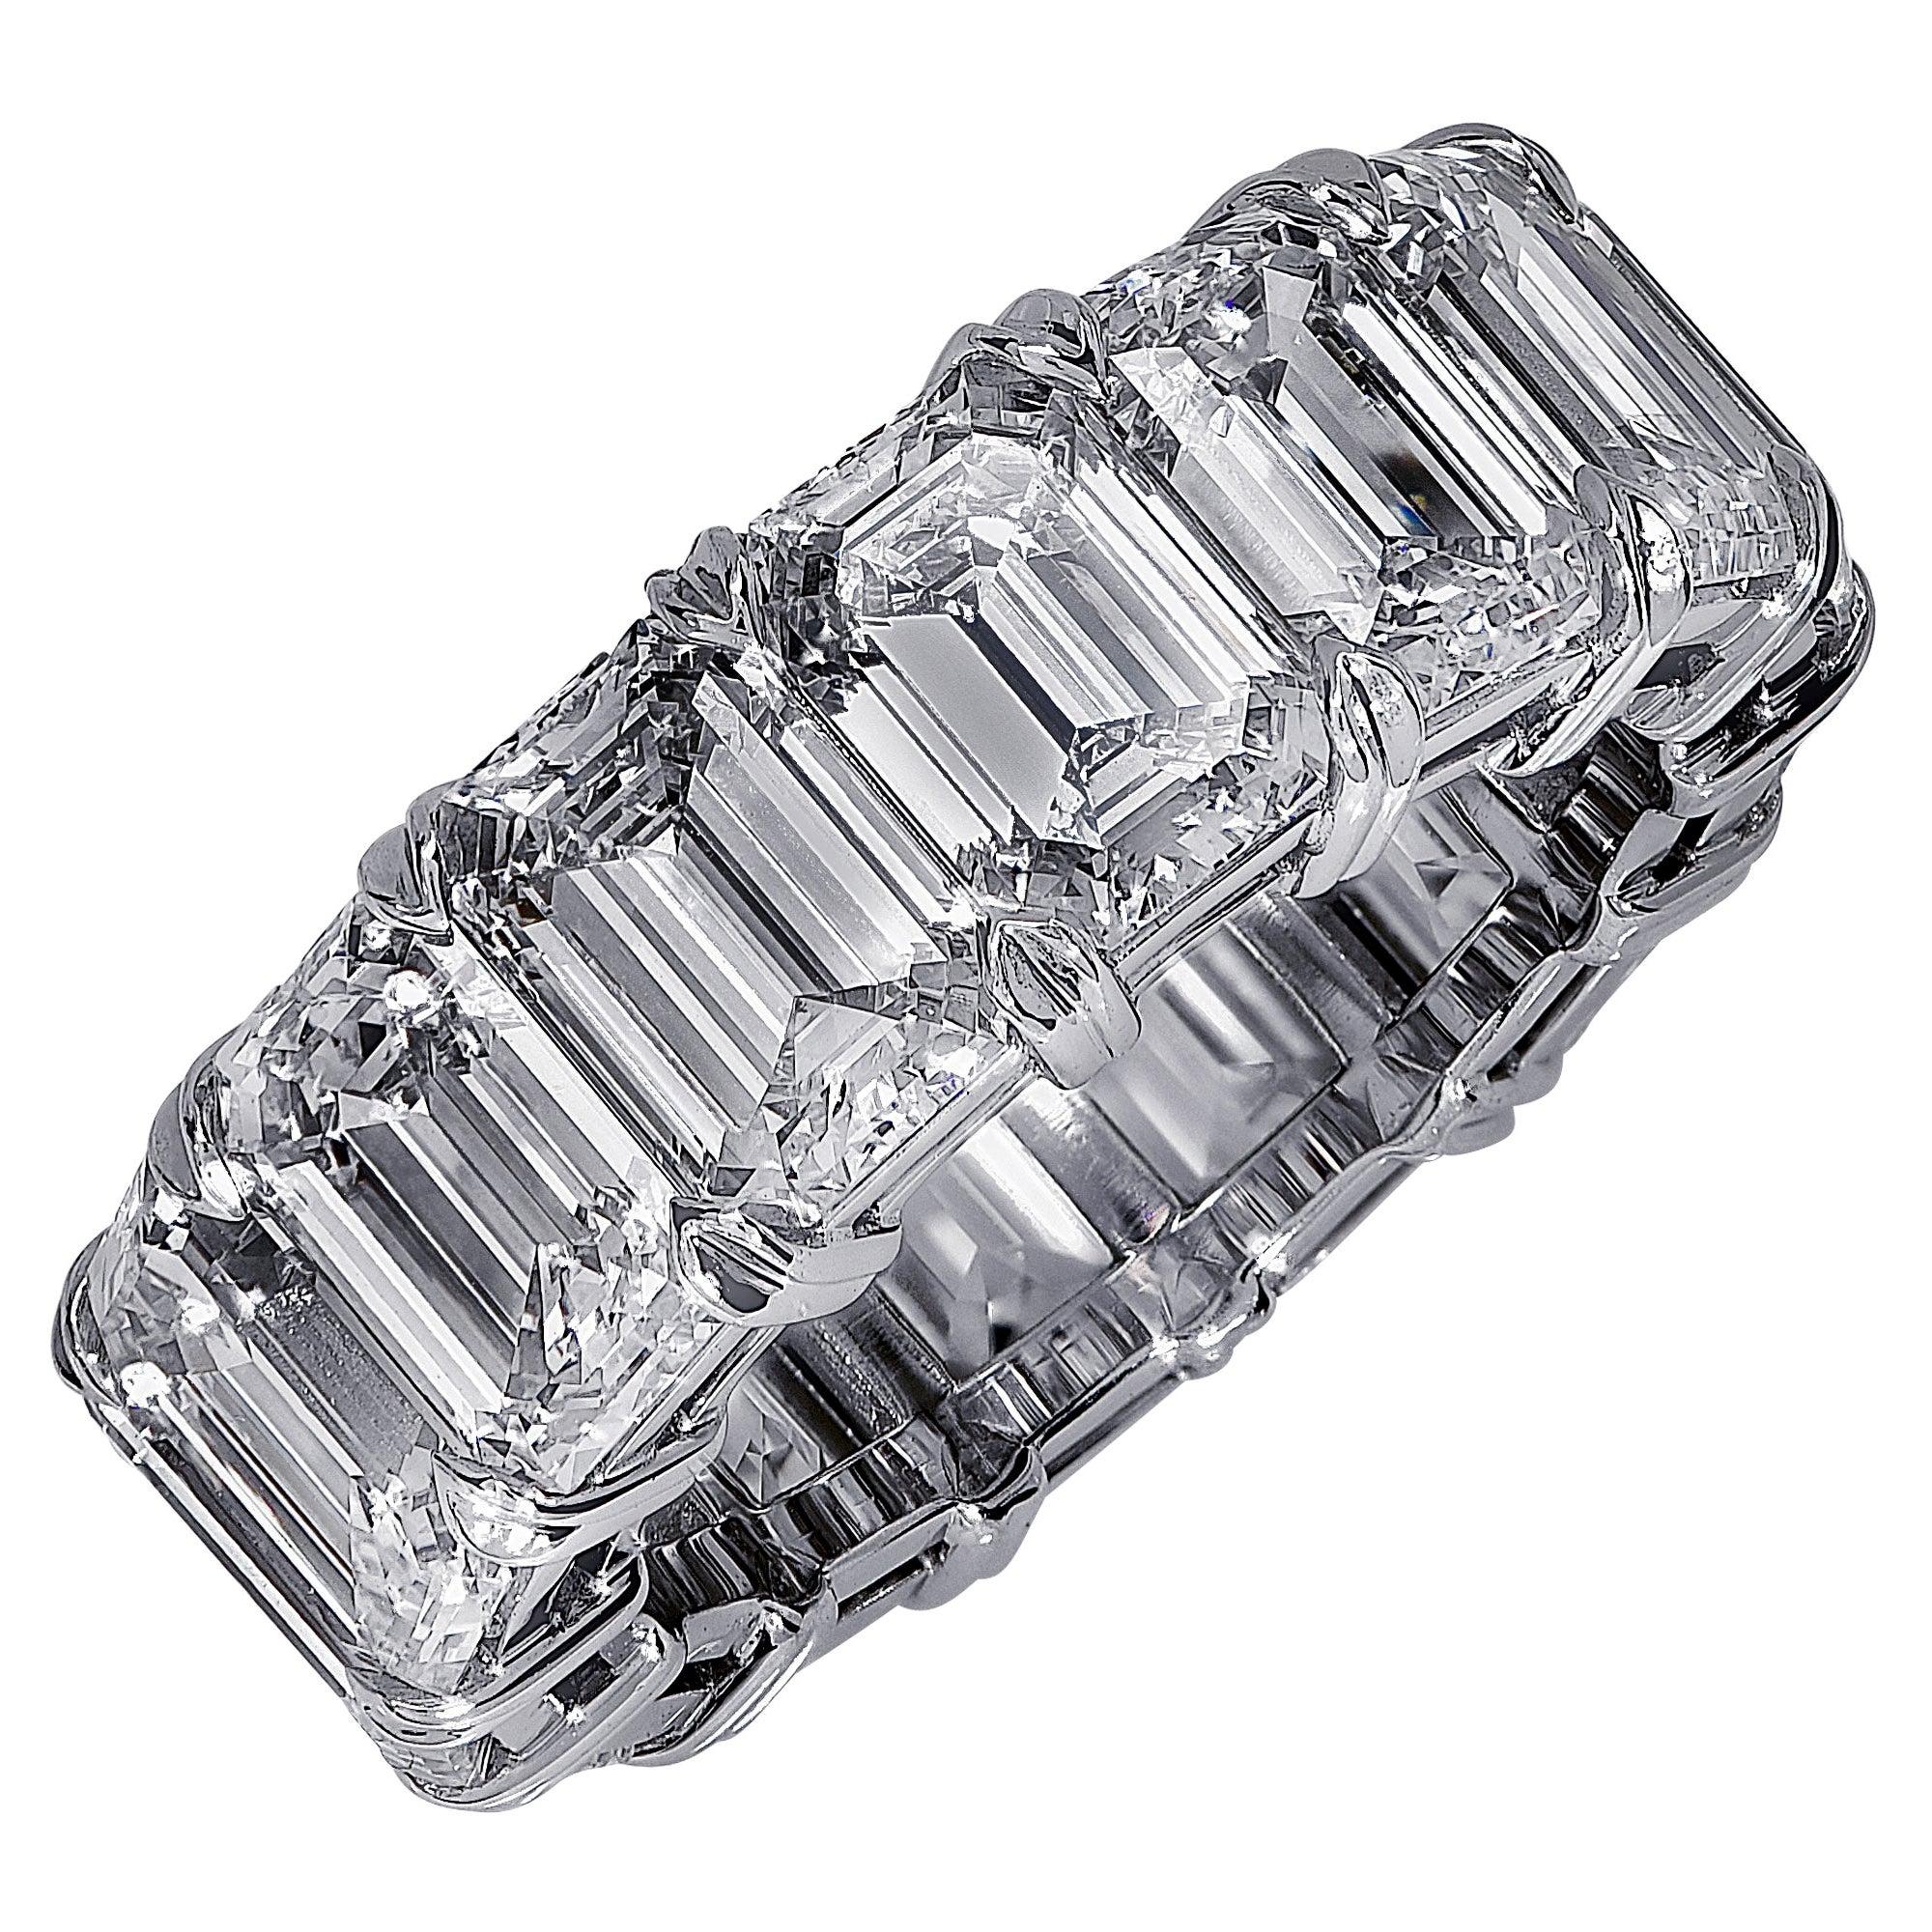 Vivid Diamonds GIA Certified 15.18 Carat Emerald Cut Diamond Eternity Band